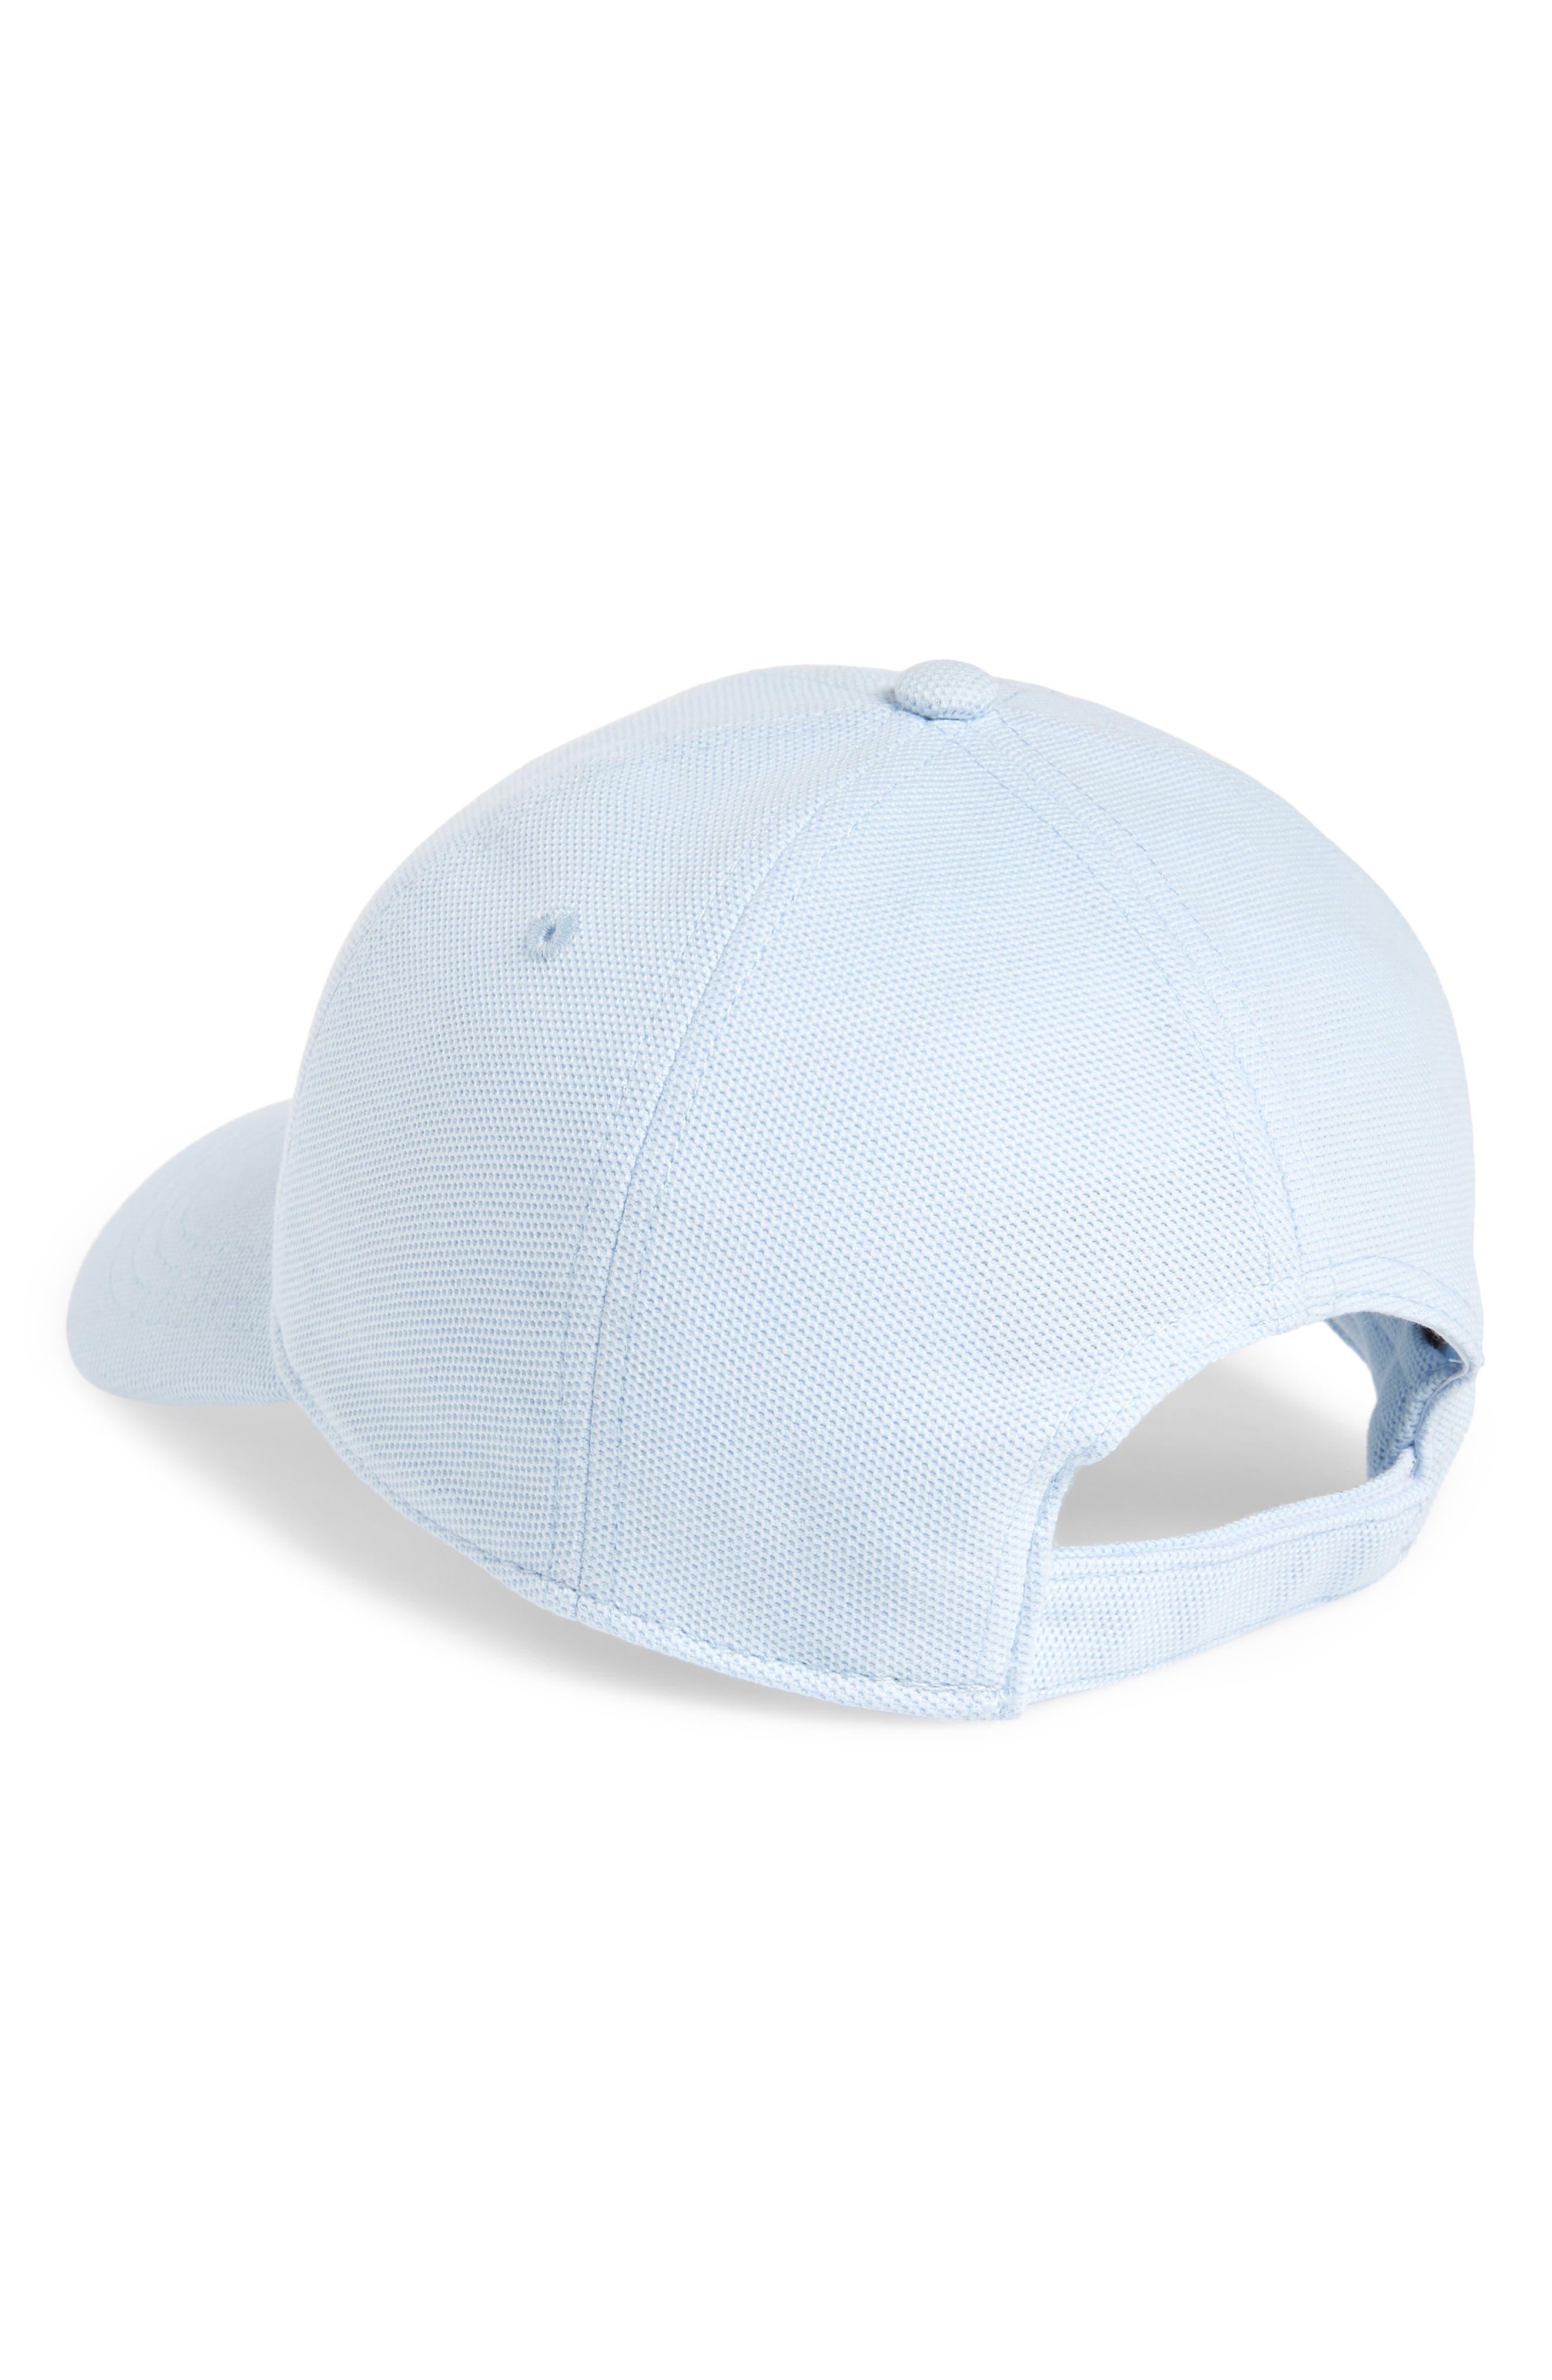 LACOSTE, Croc Cotton Baseball Cap, Alternate thumbnail 2, color, RILL